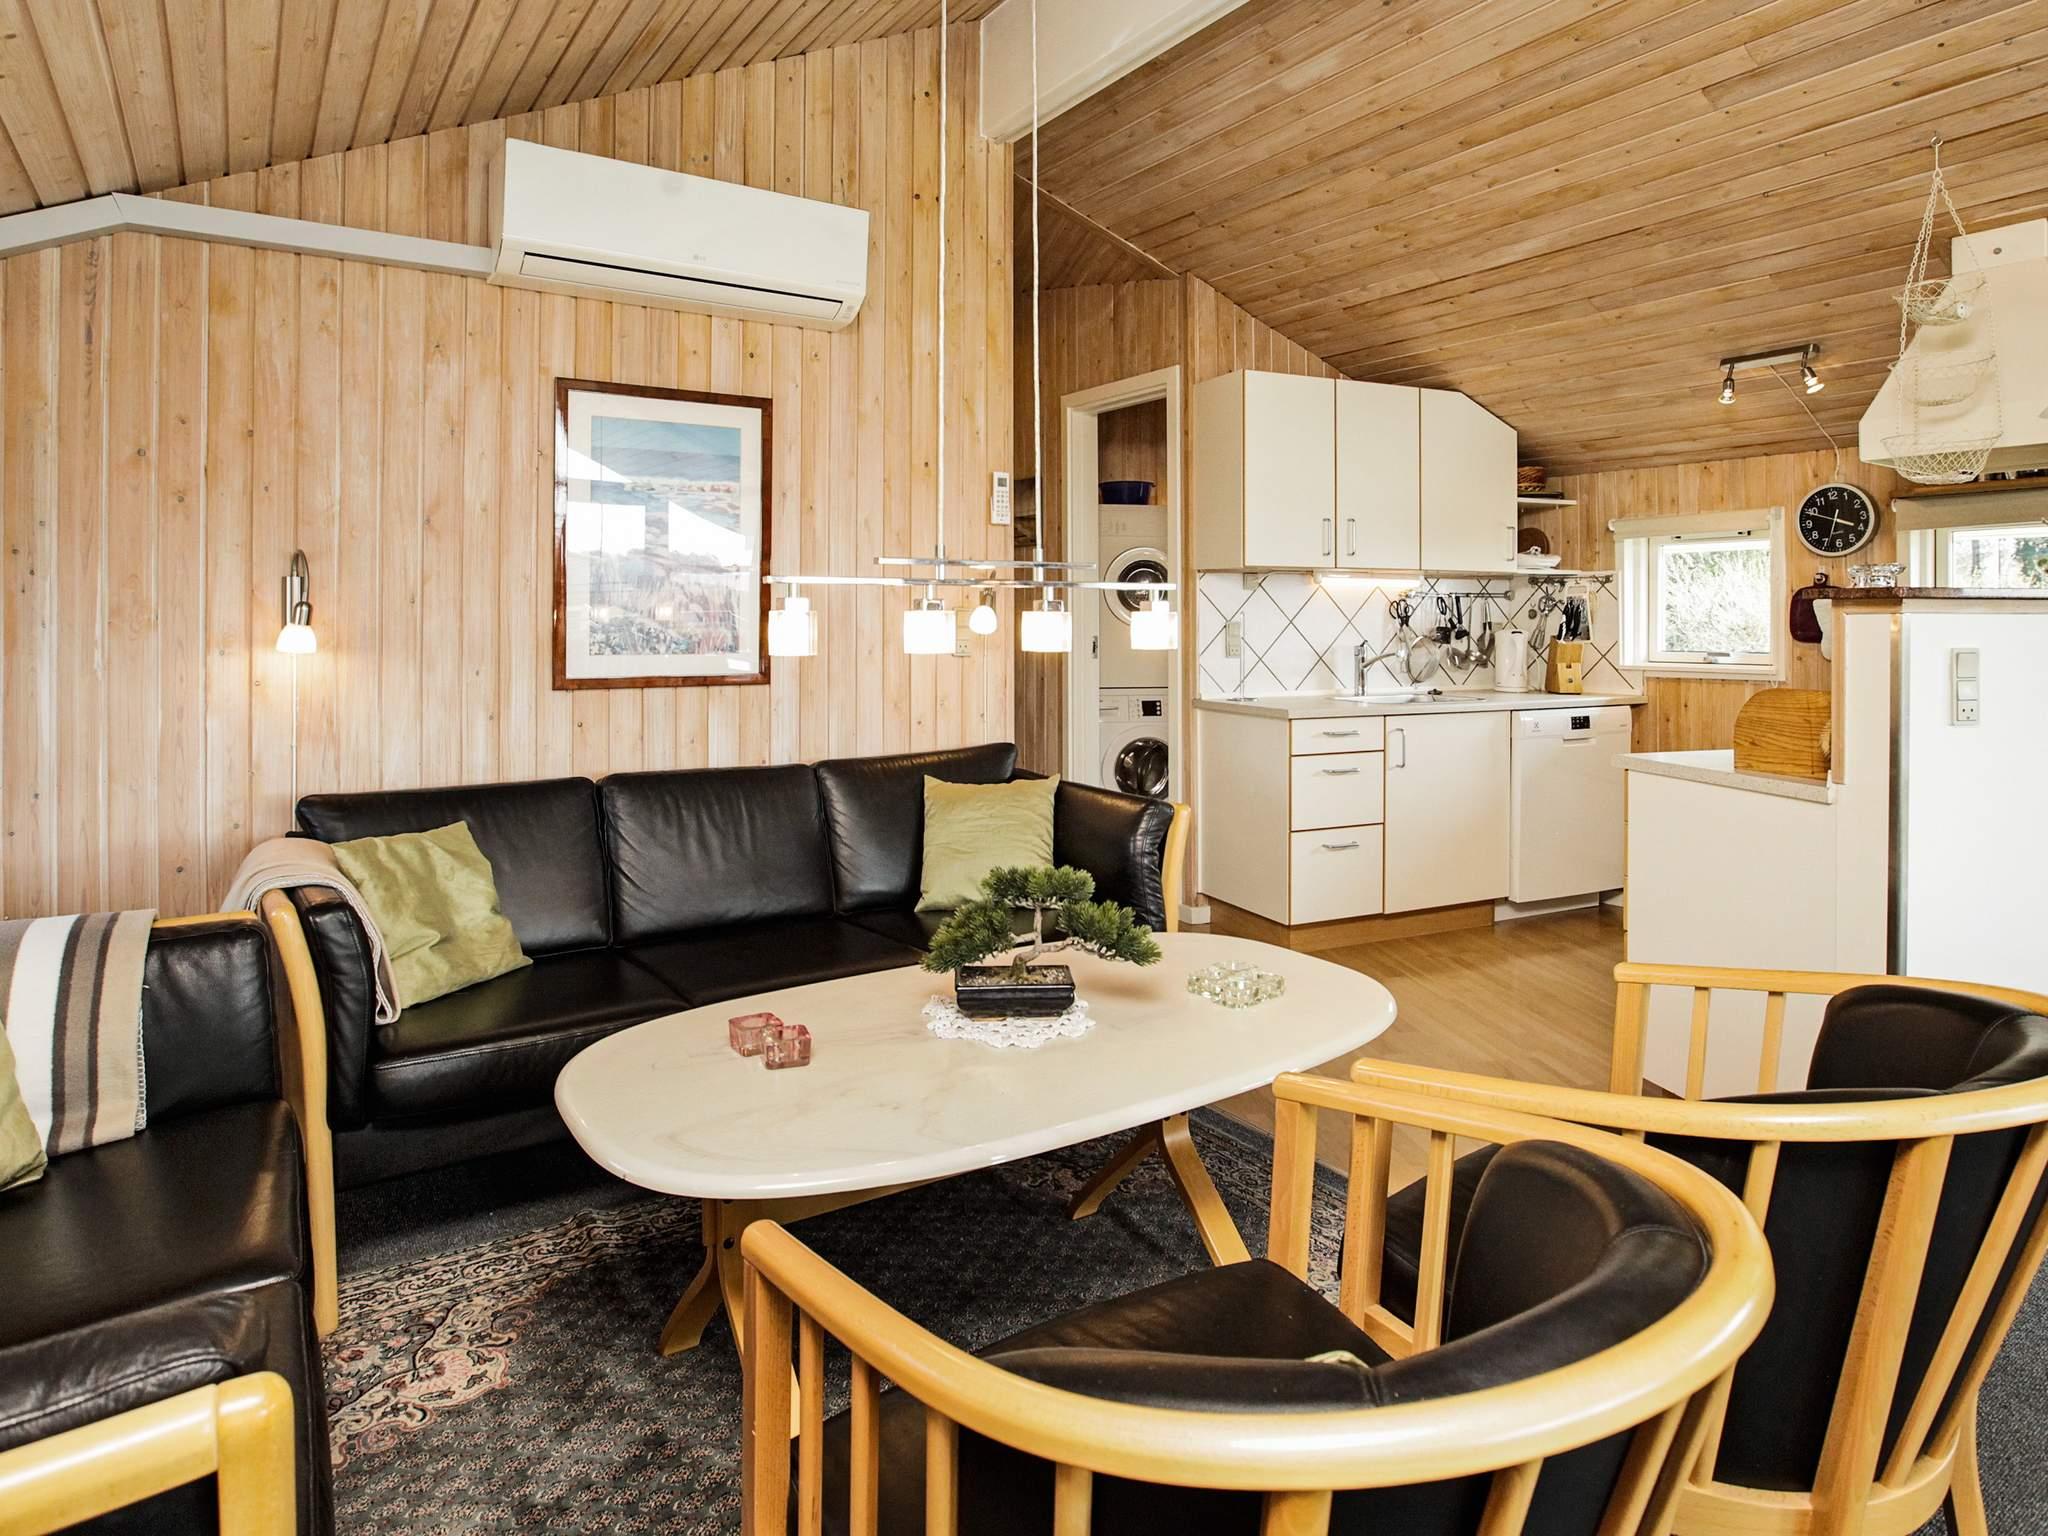 Maison de vacances Falsled (87545), Faldsled, , Fionie, Danemark, image 7